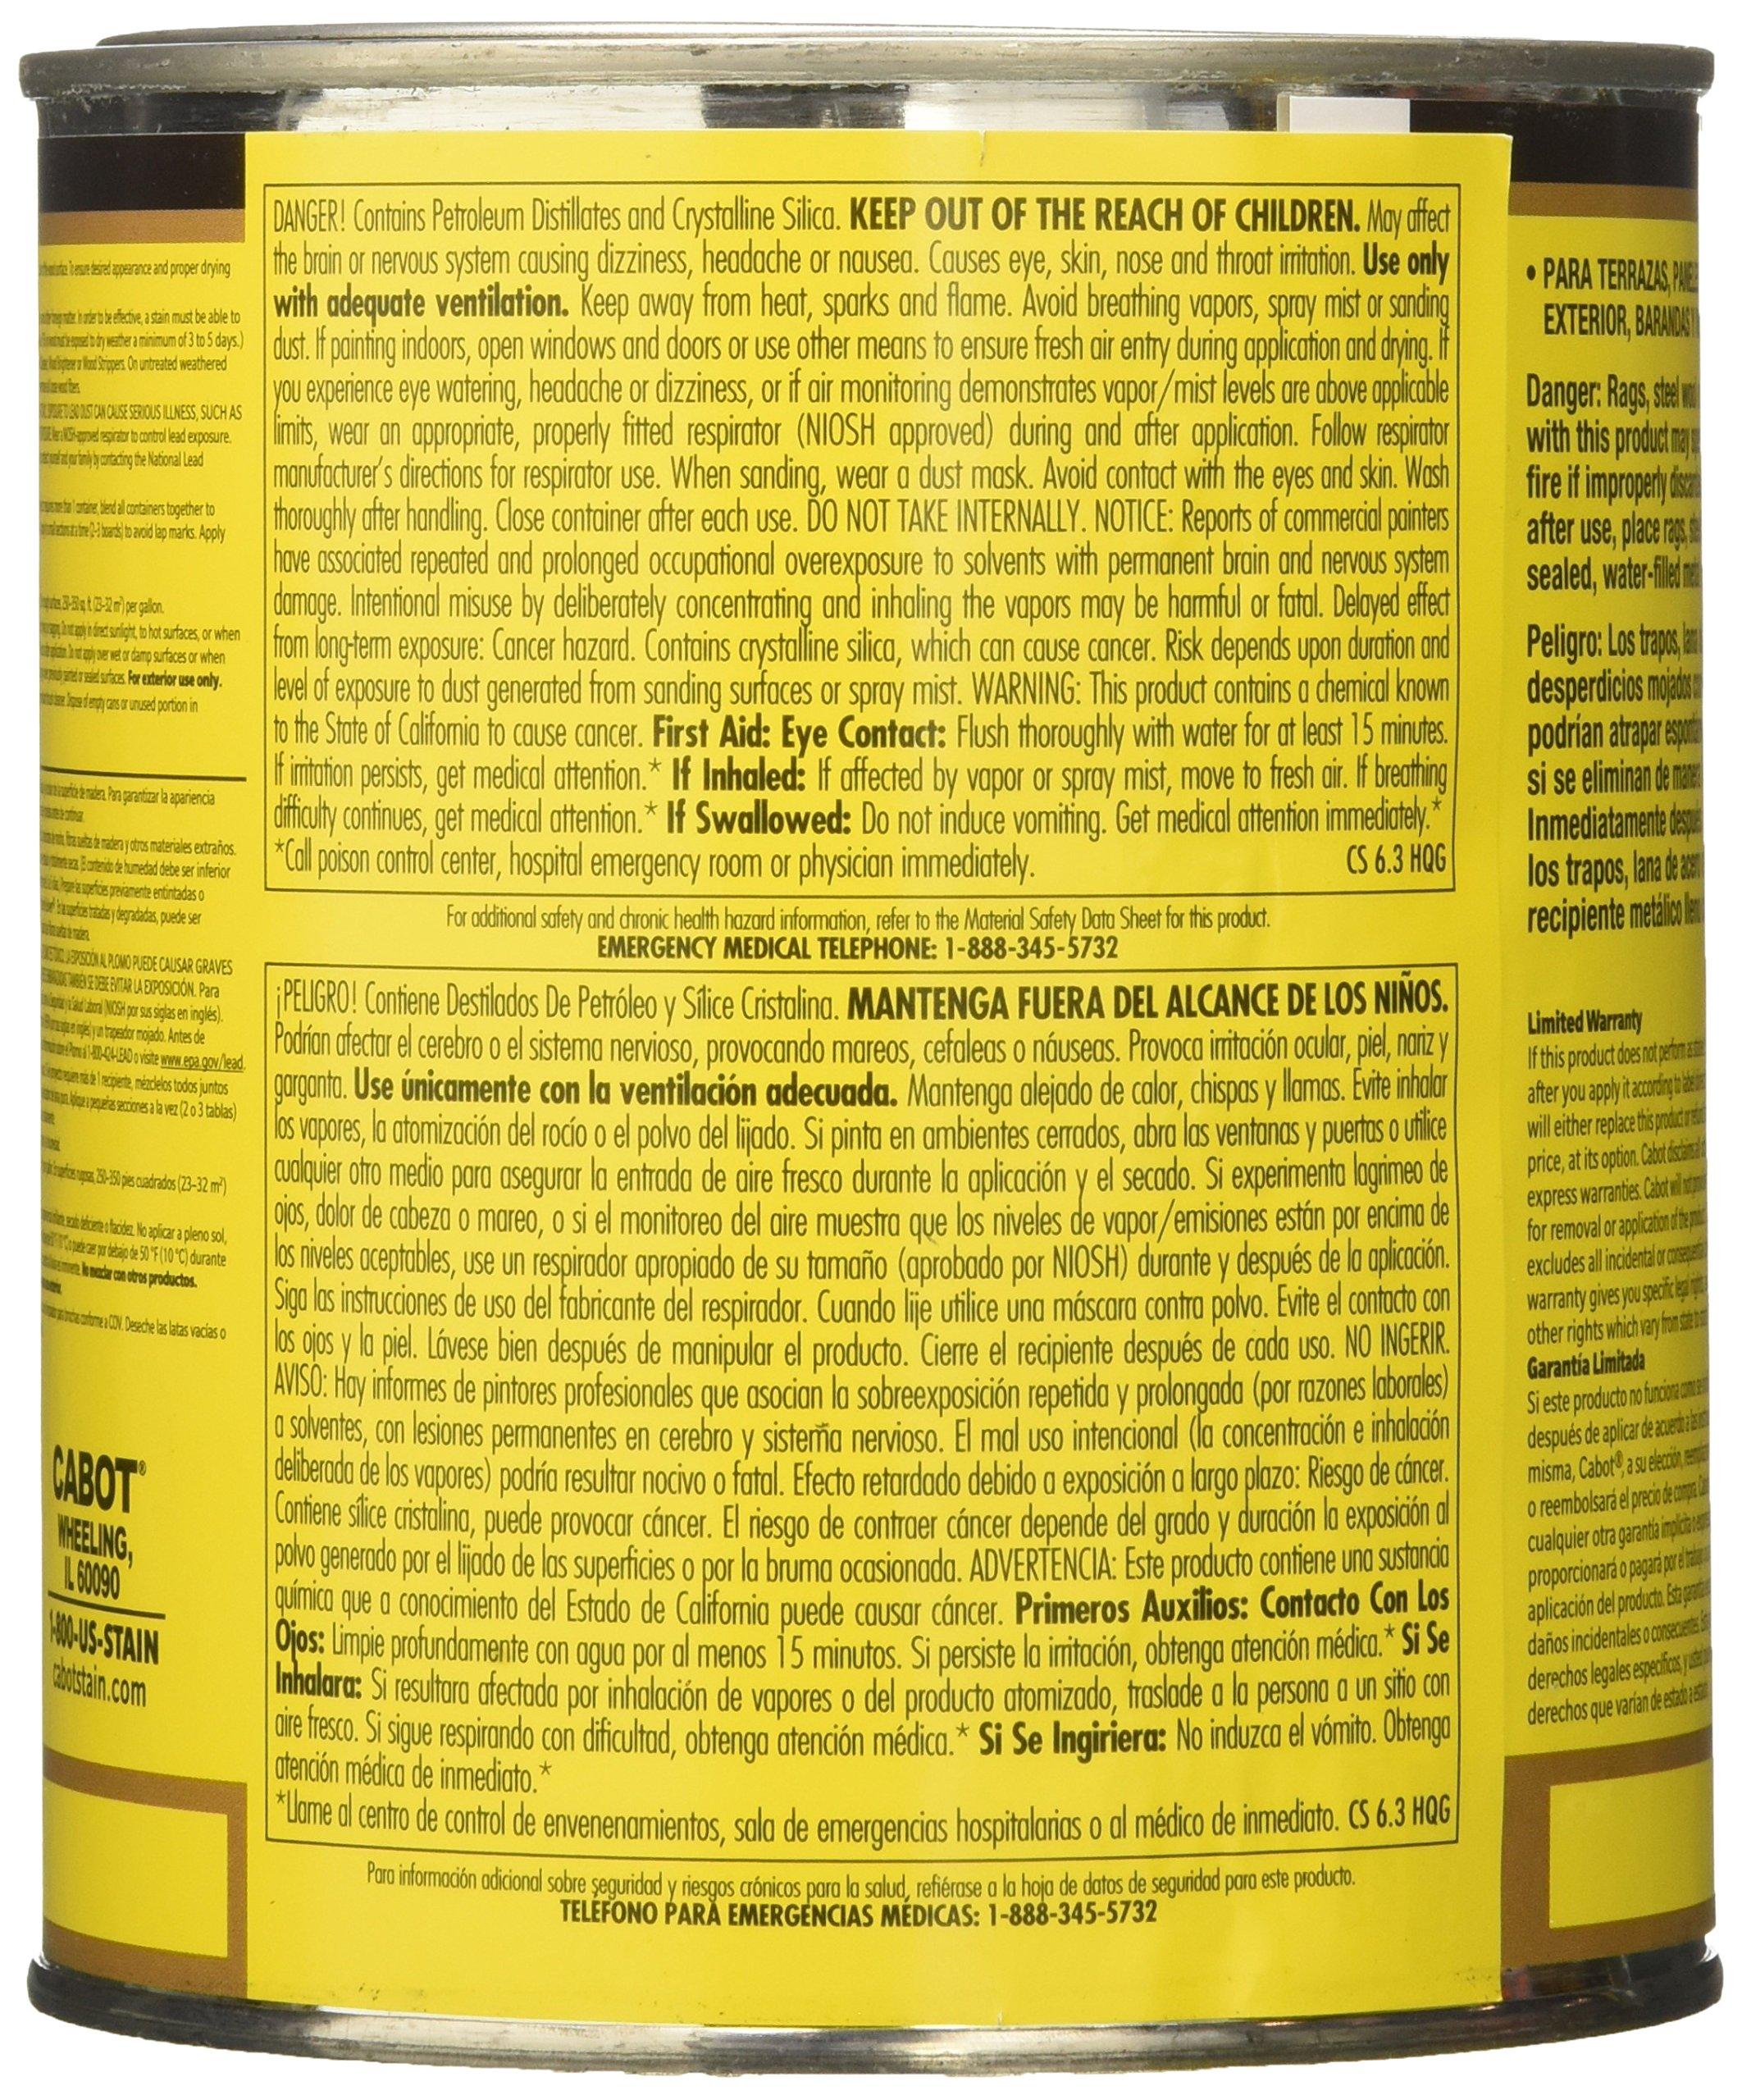 CabotStain 04-3400 Australian Timber Oil Penetrating formula, 1 quart, Natural